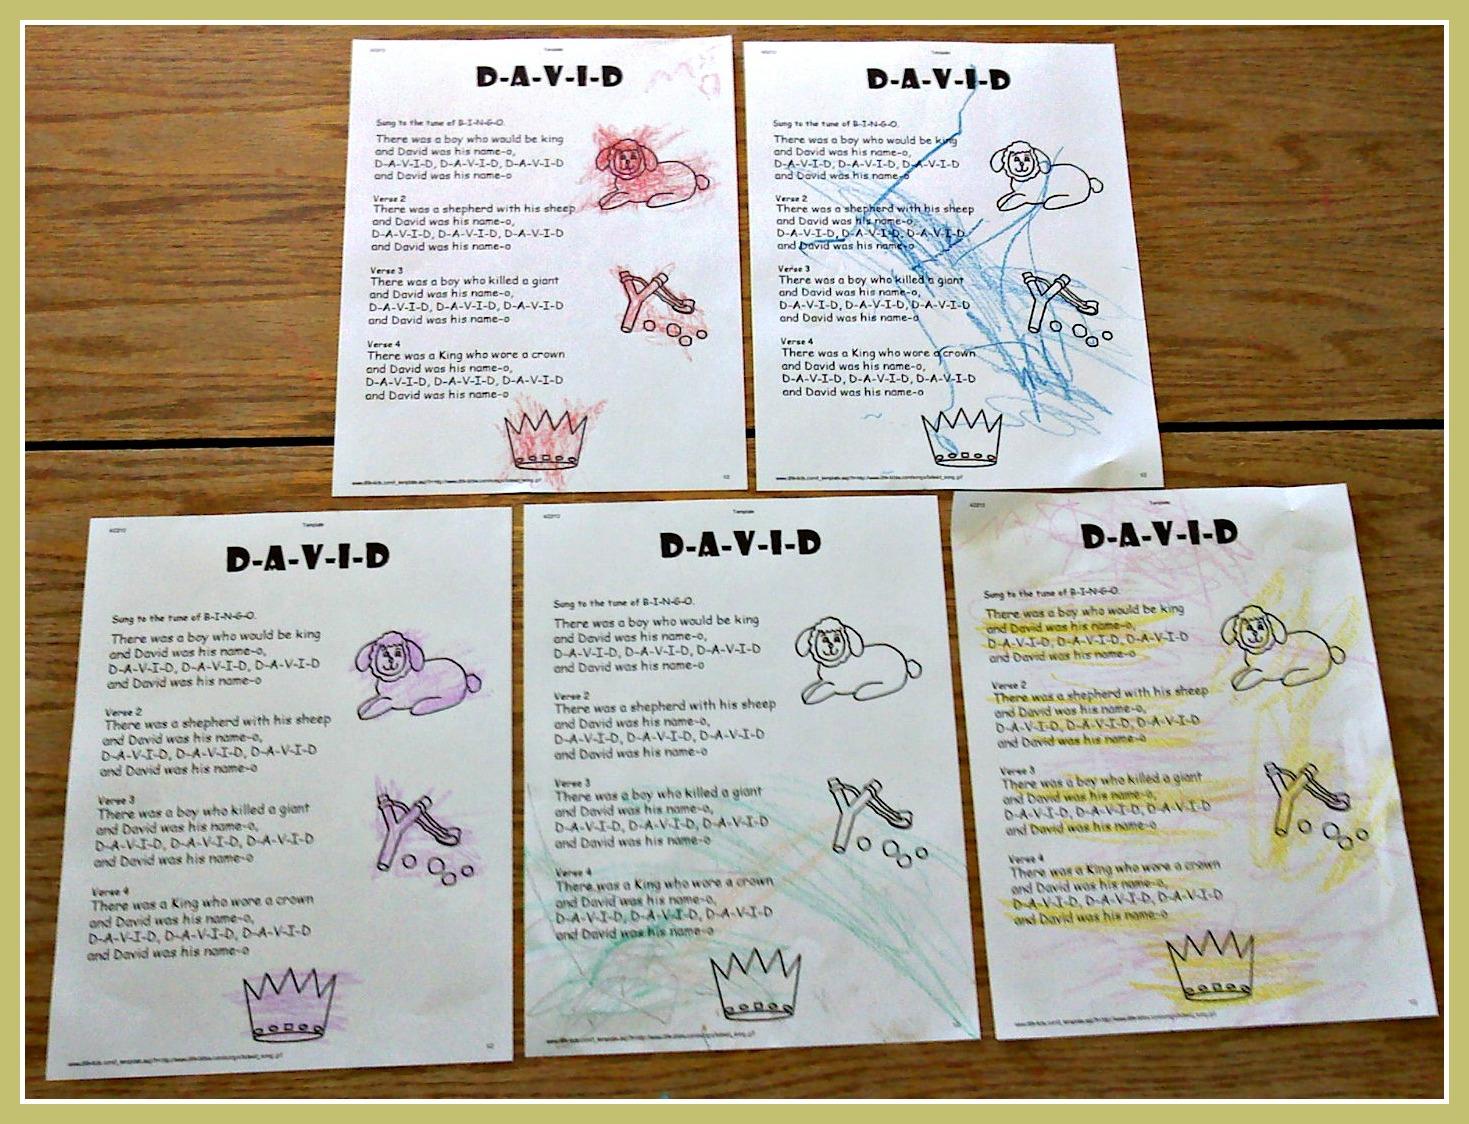 The Walnut Acre Chronicles David Unit Study